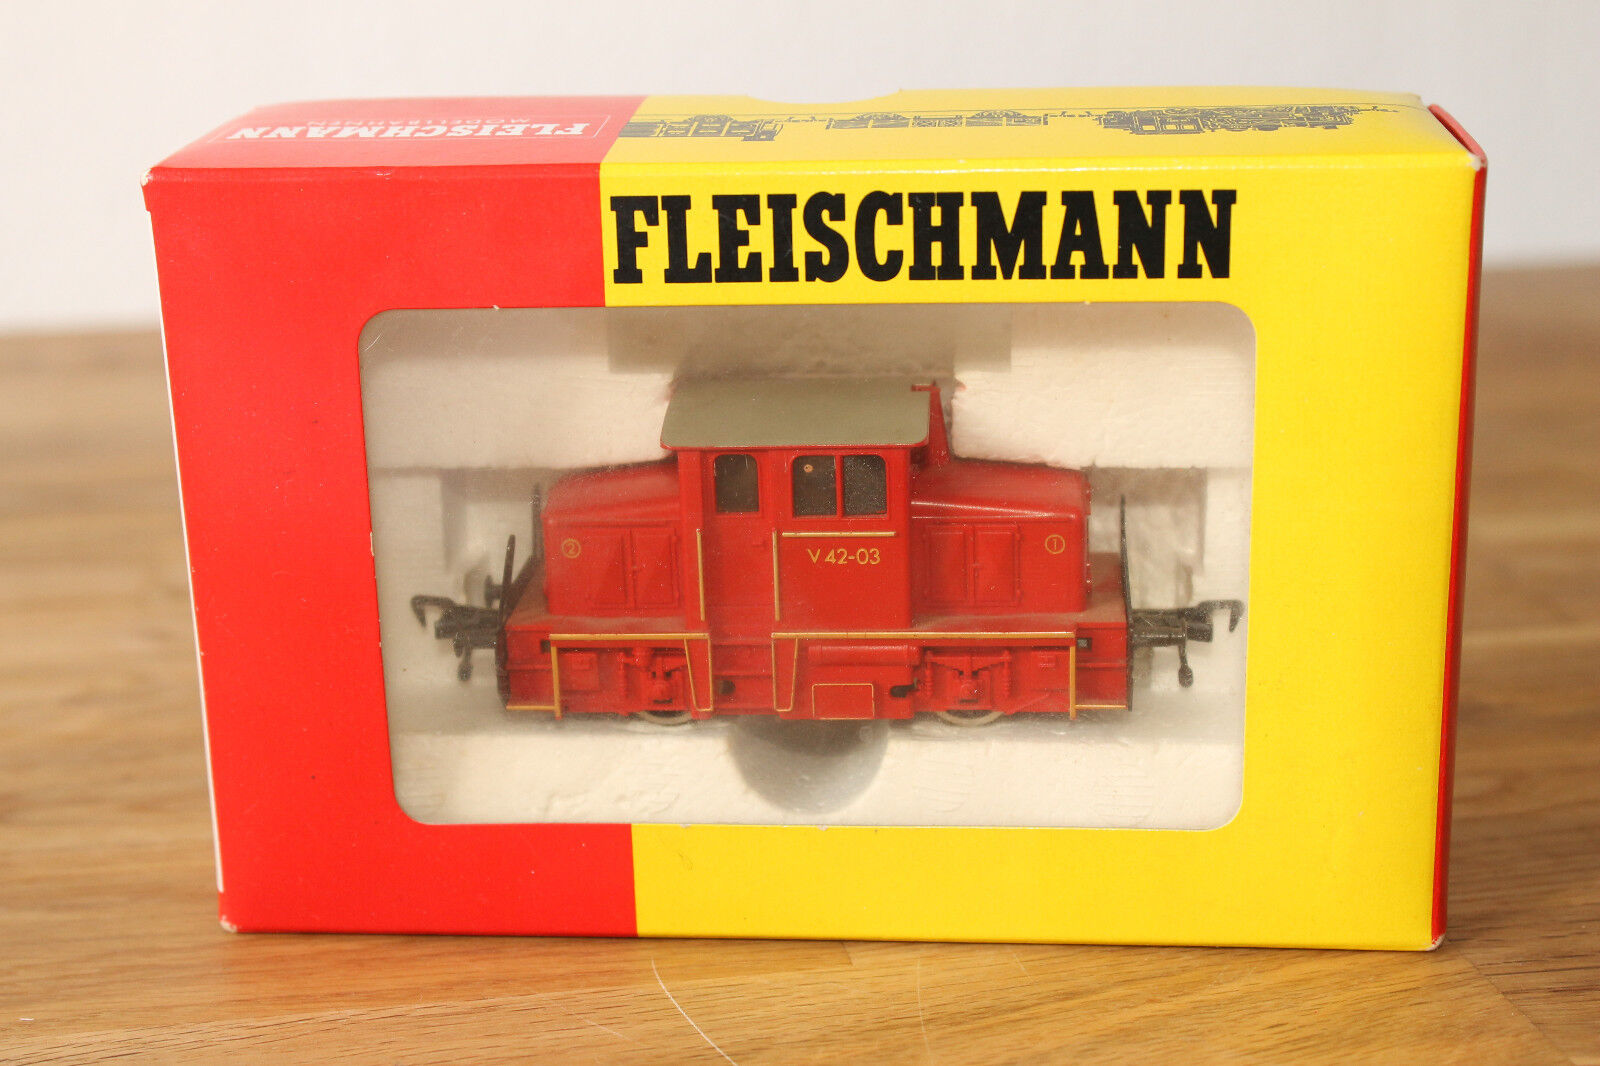 H0 Fleischmann Fleischmann Fleischmann 4203 Rangier Diesellok V42 03 OVP  | Zuverlässige Qualität  3ed0b9